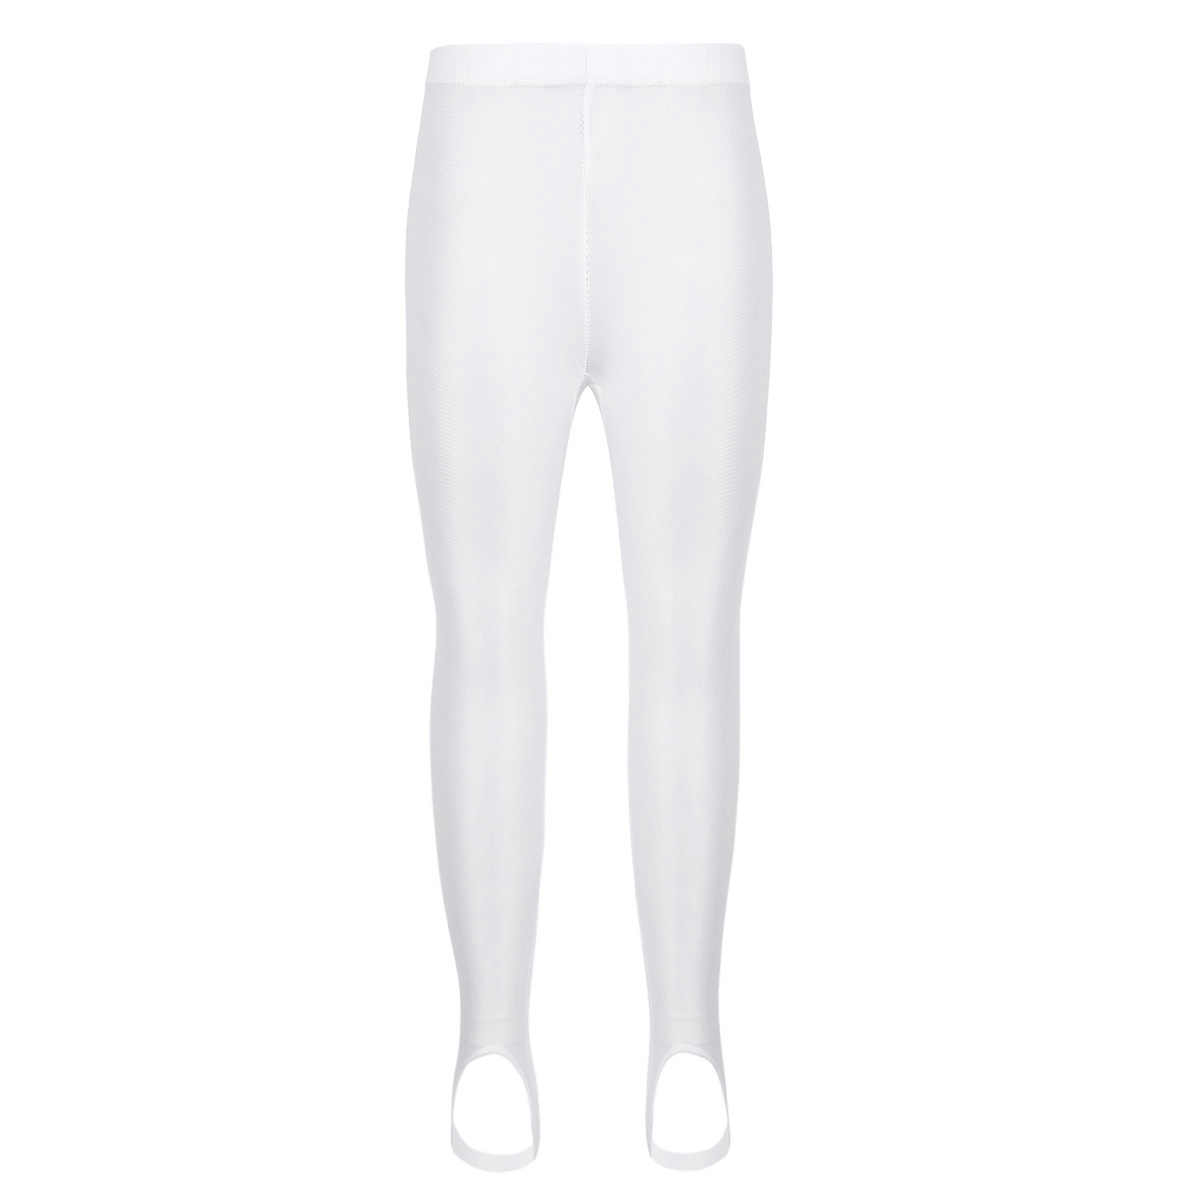 42ff429067ade ... Kids Elastic Stirrup Ballet Pantyhose for Girls Boys Soft Dance Tights  Yoga Gymnastics Ballet Leggings Stocking ...